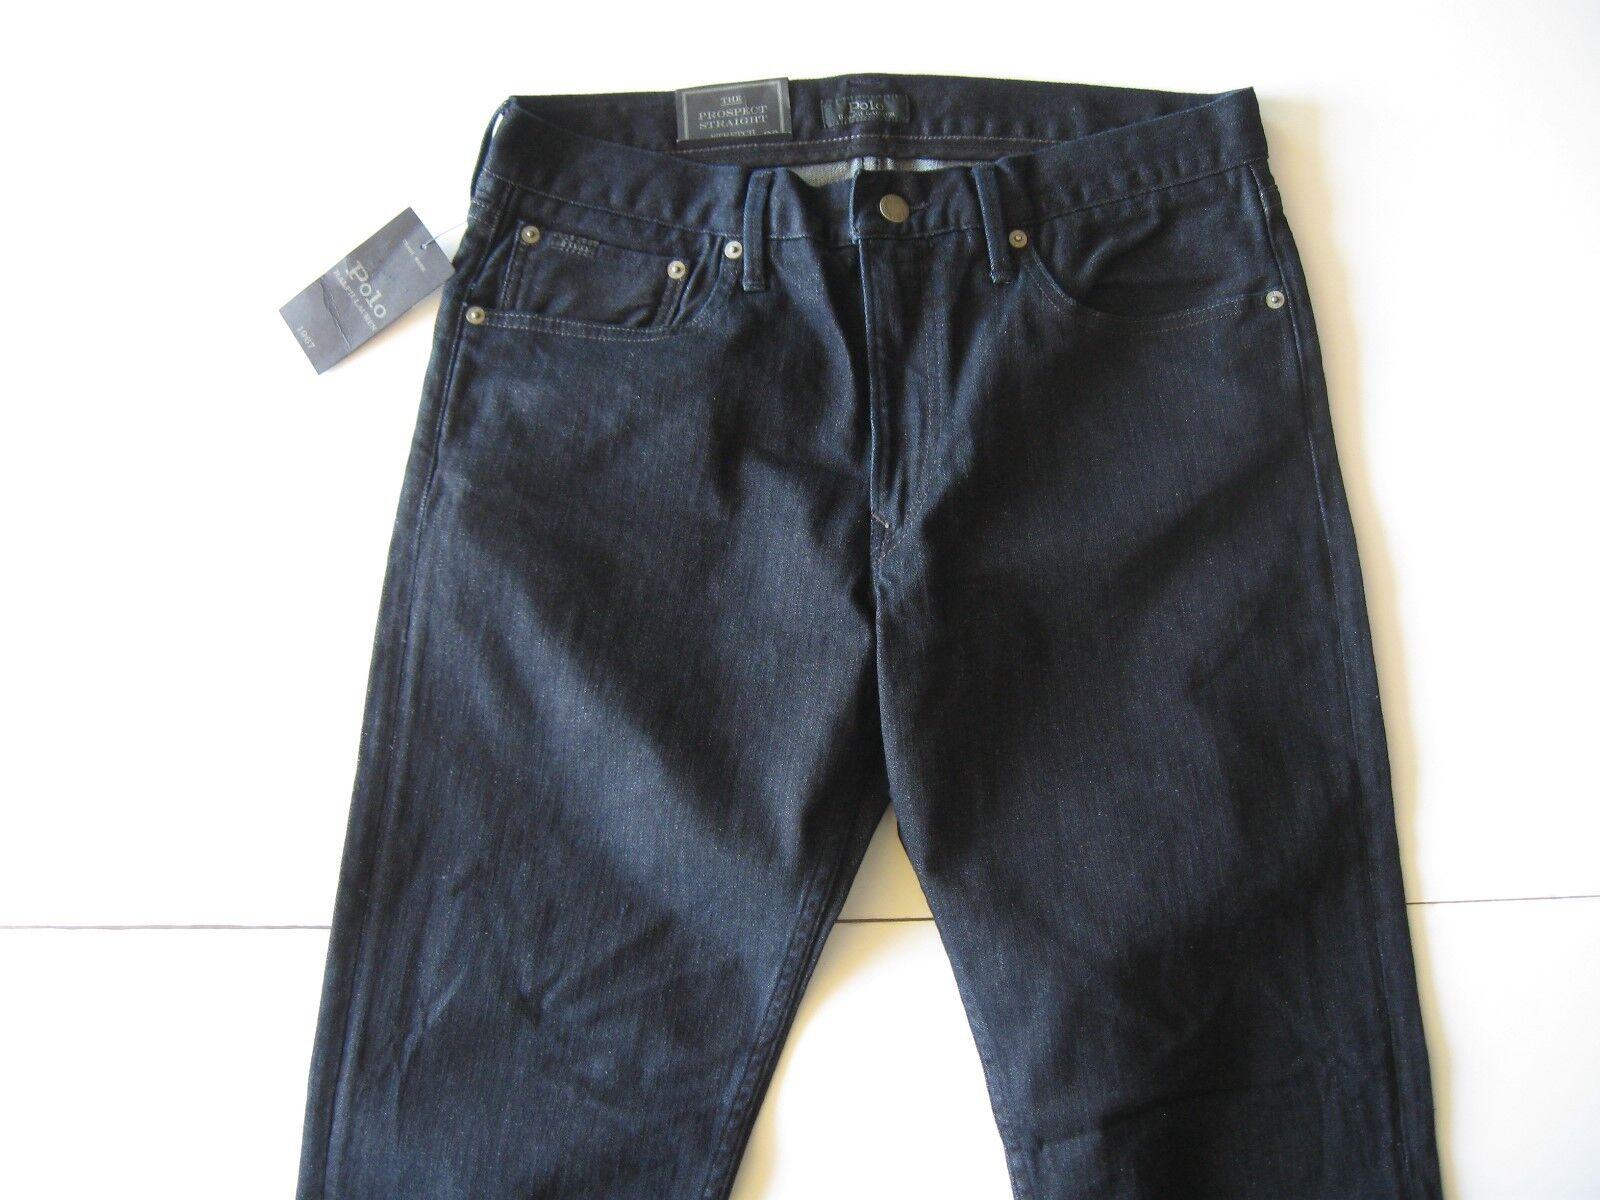 POLO RALPH LAUREN Men's Prospect Straight Dark Indigo Stretch Jeans 34x34